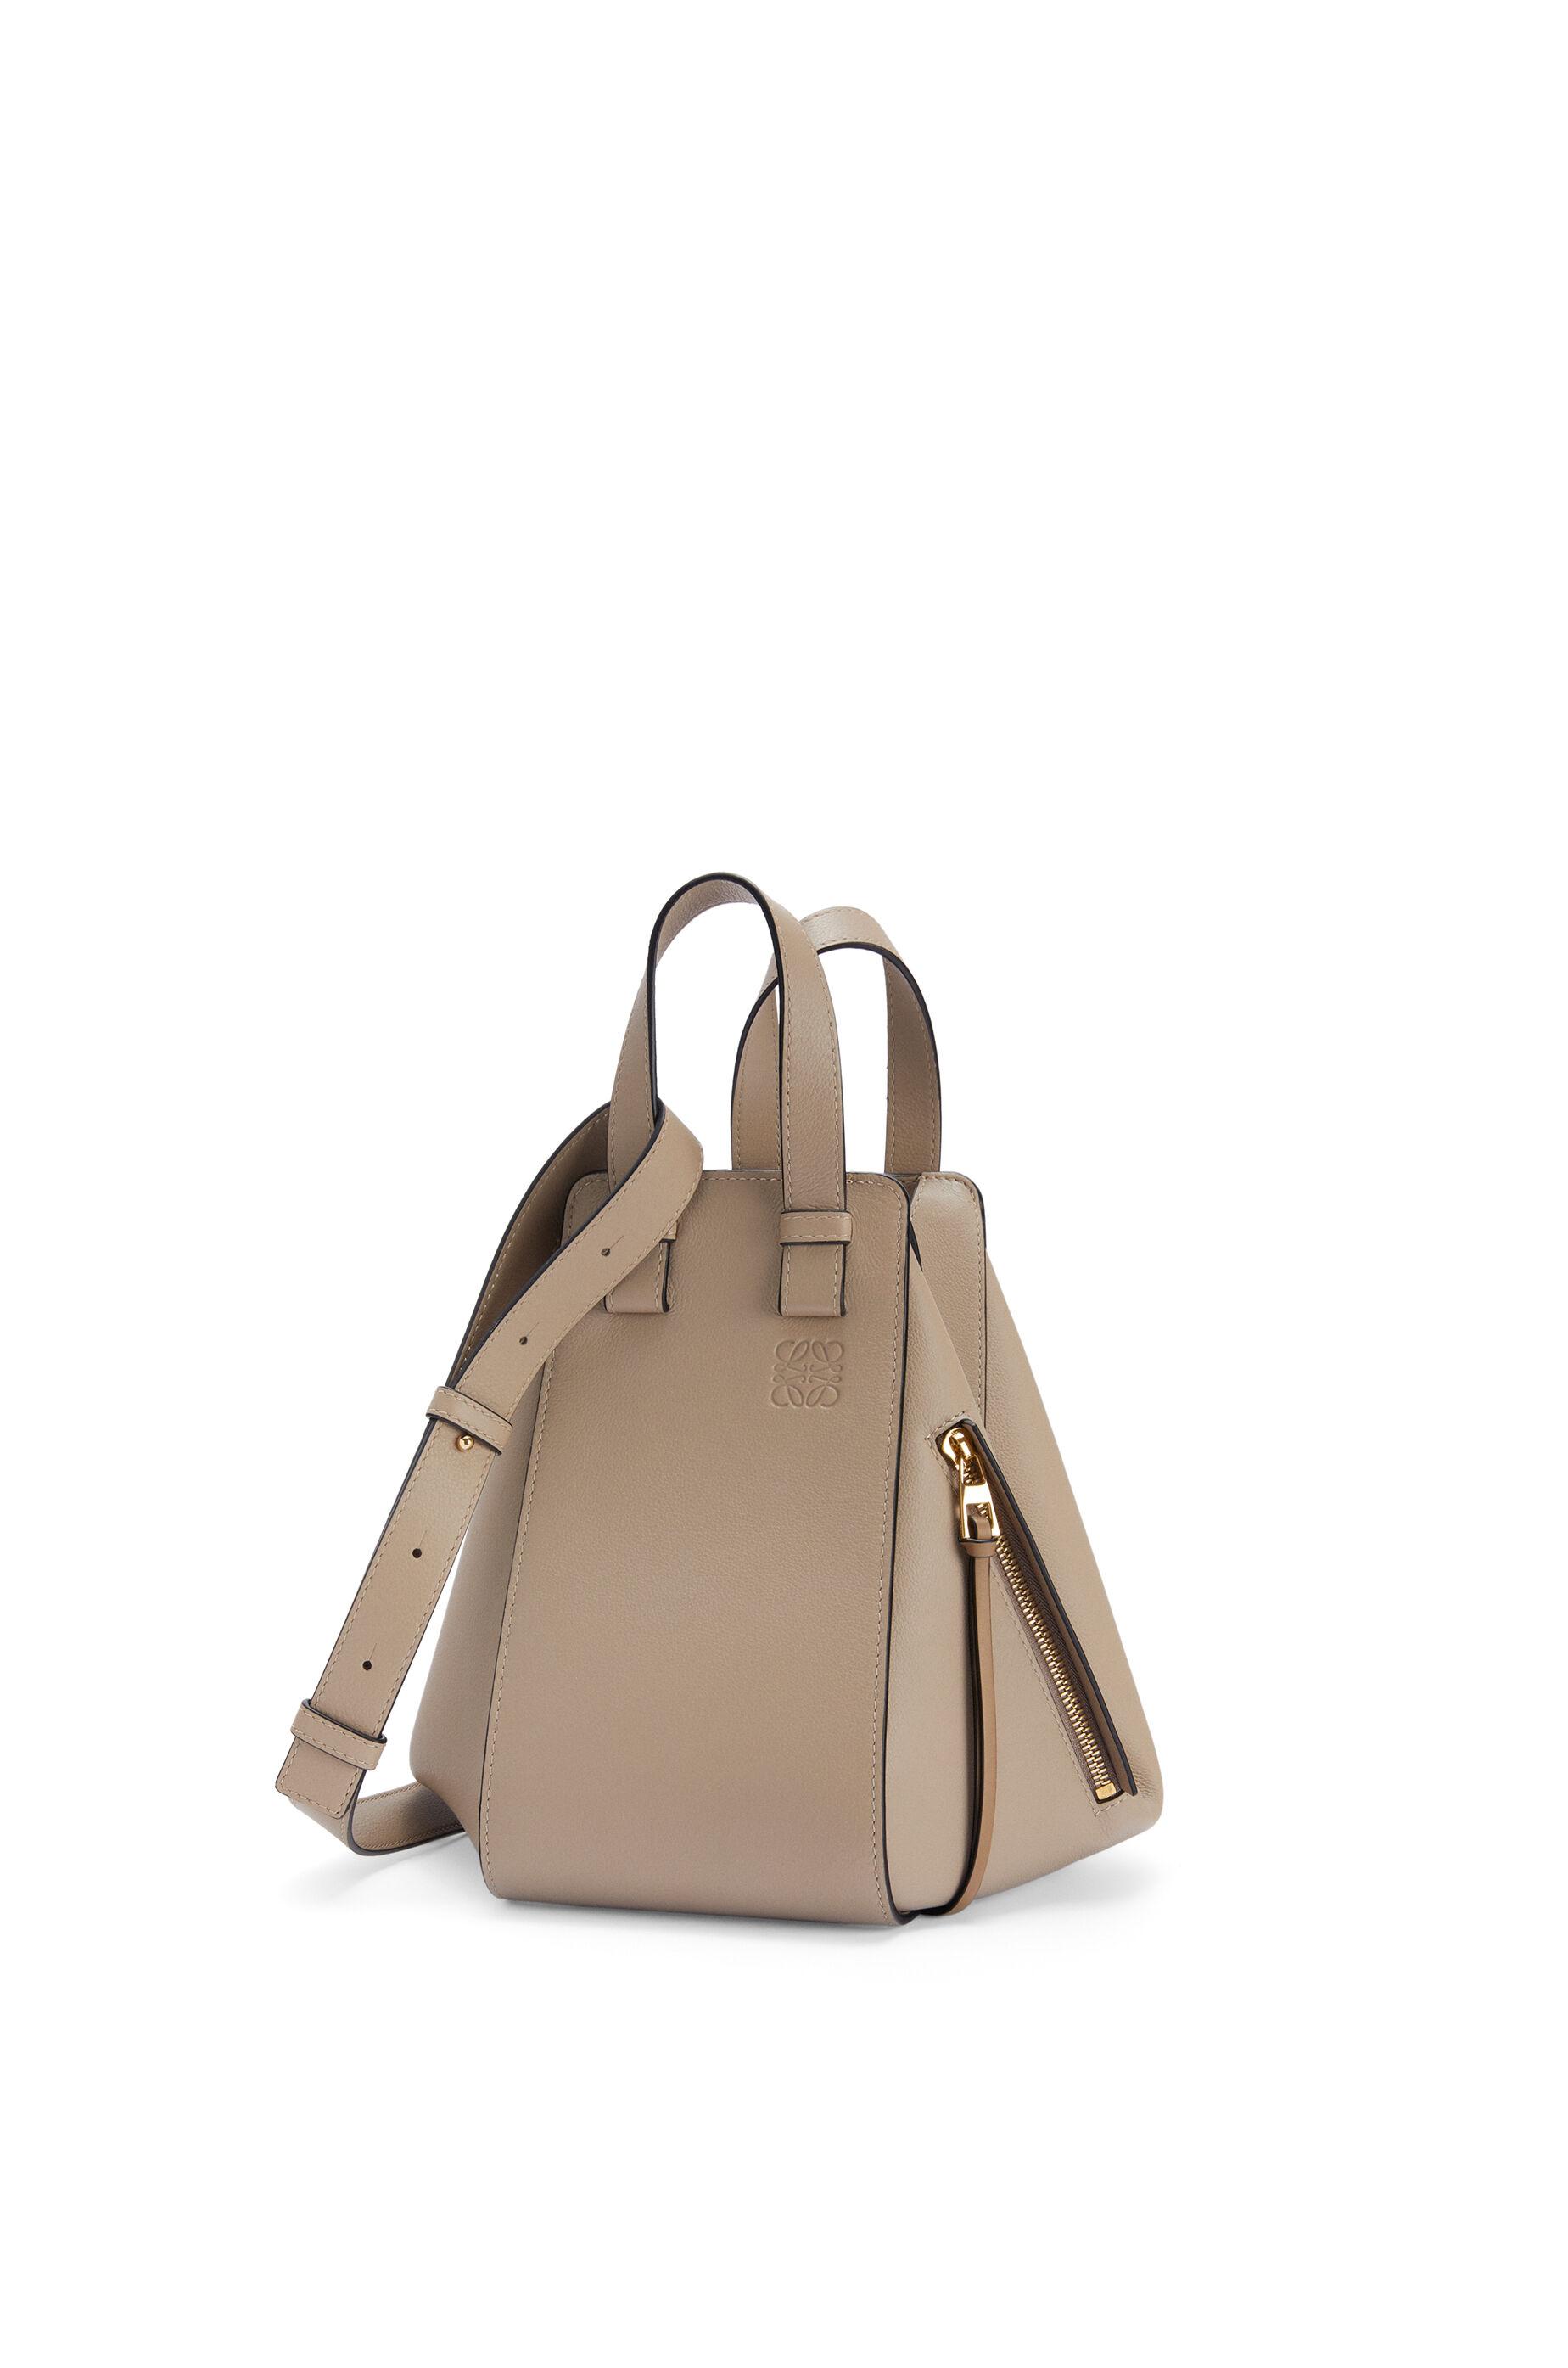 loewe bag price